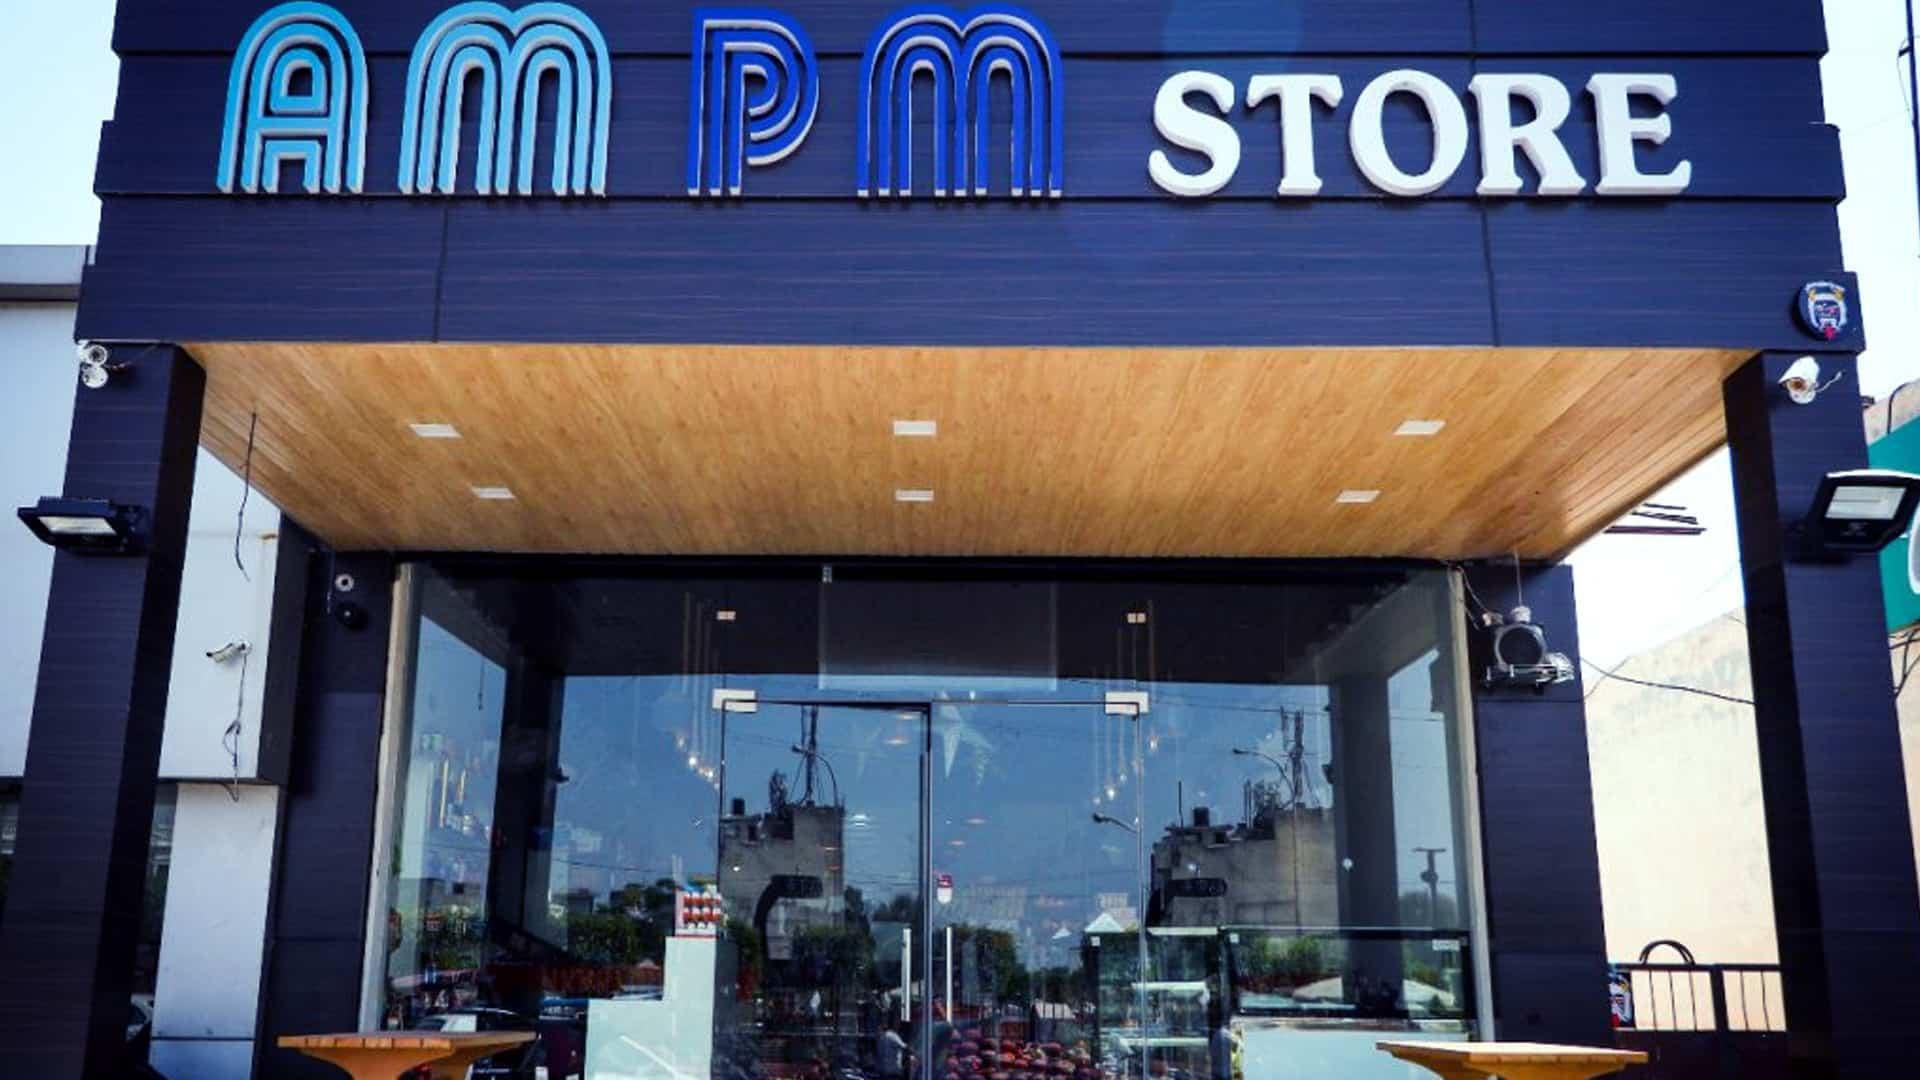 Convenience store start-up AMPM raises Rs 1.6 crore funding